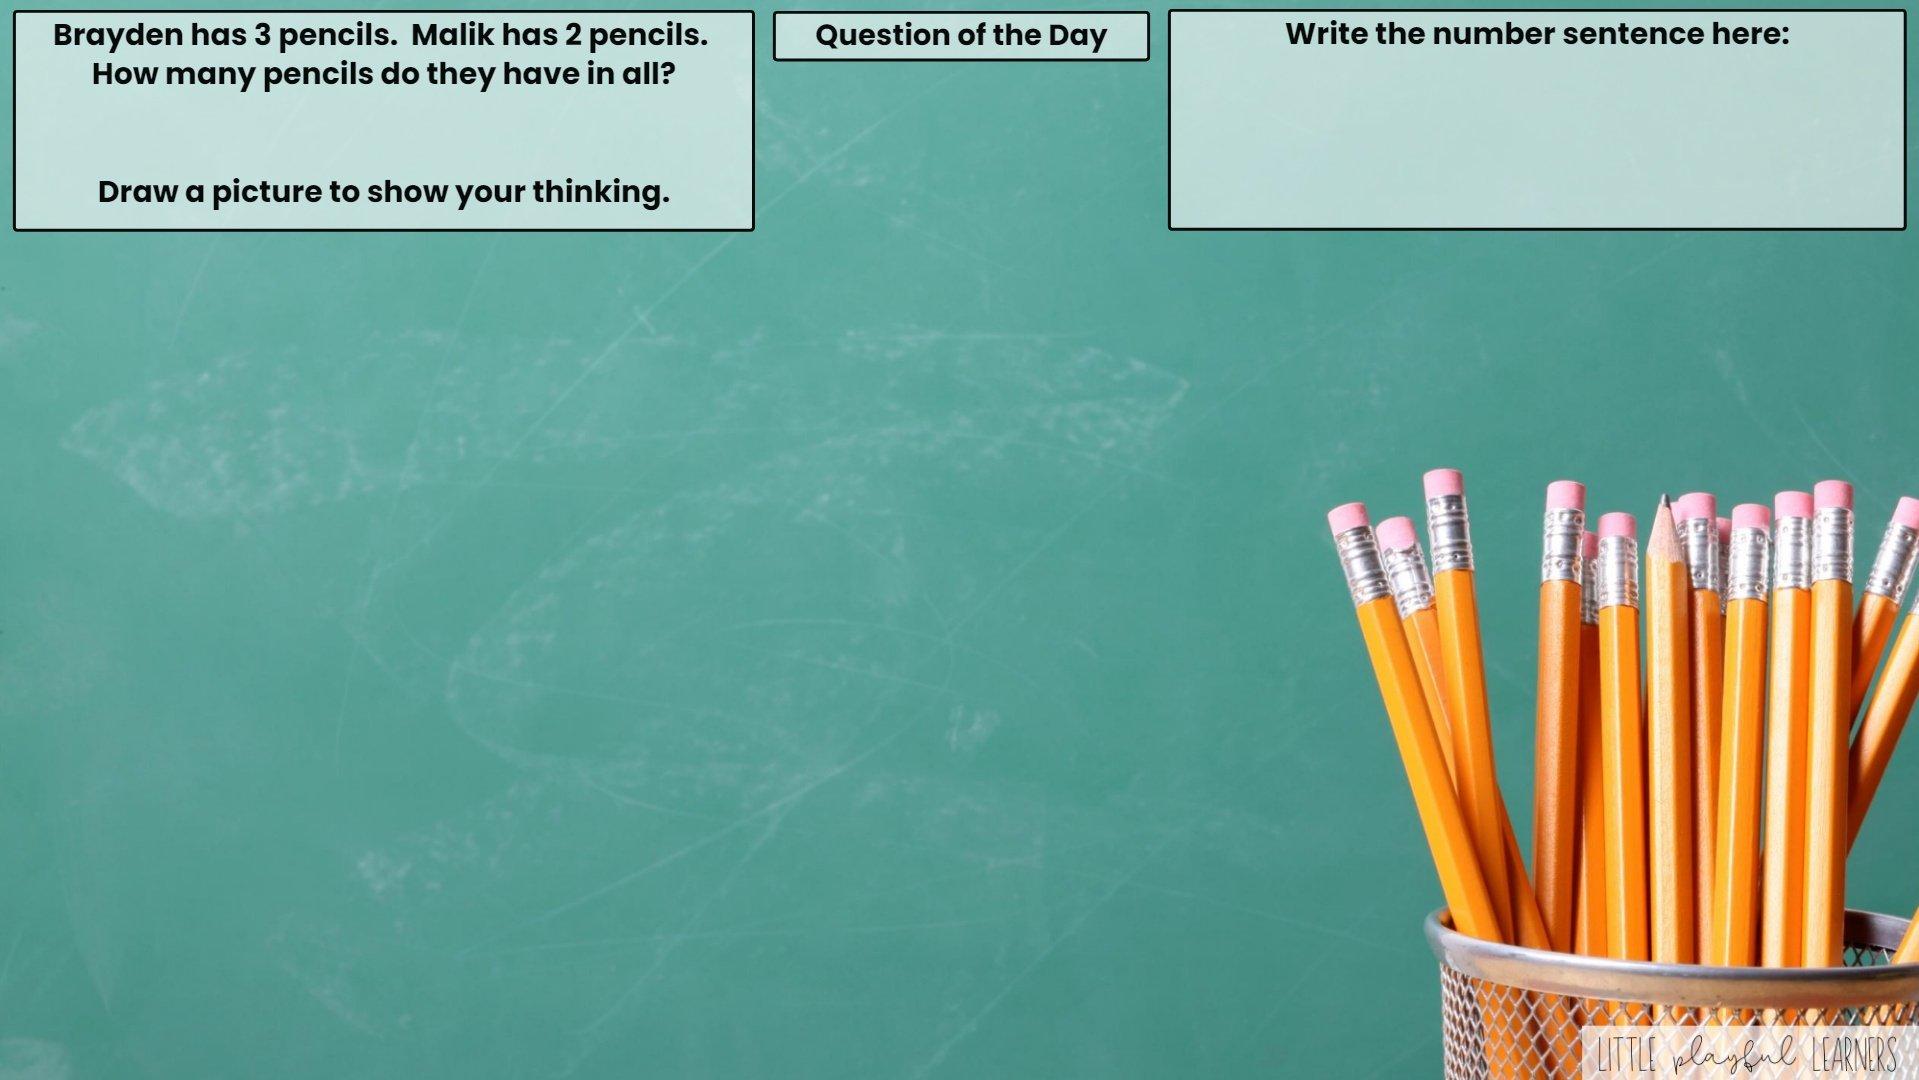 Seesaw: Story problem - school supplies theme